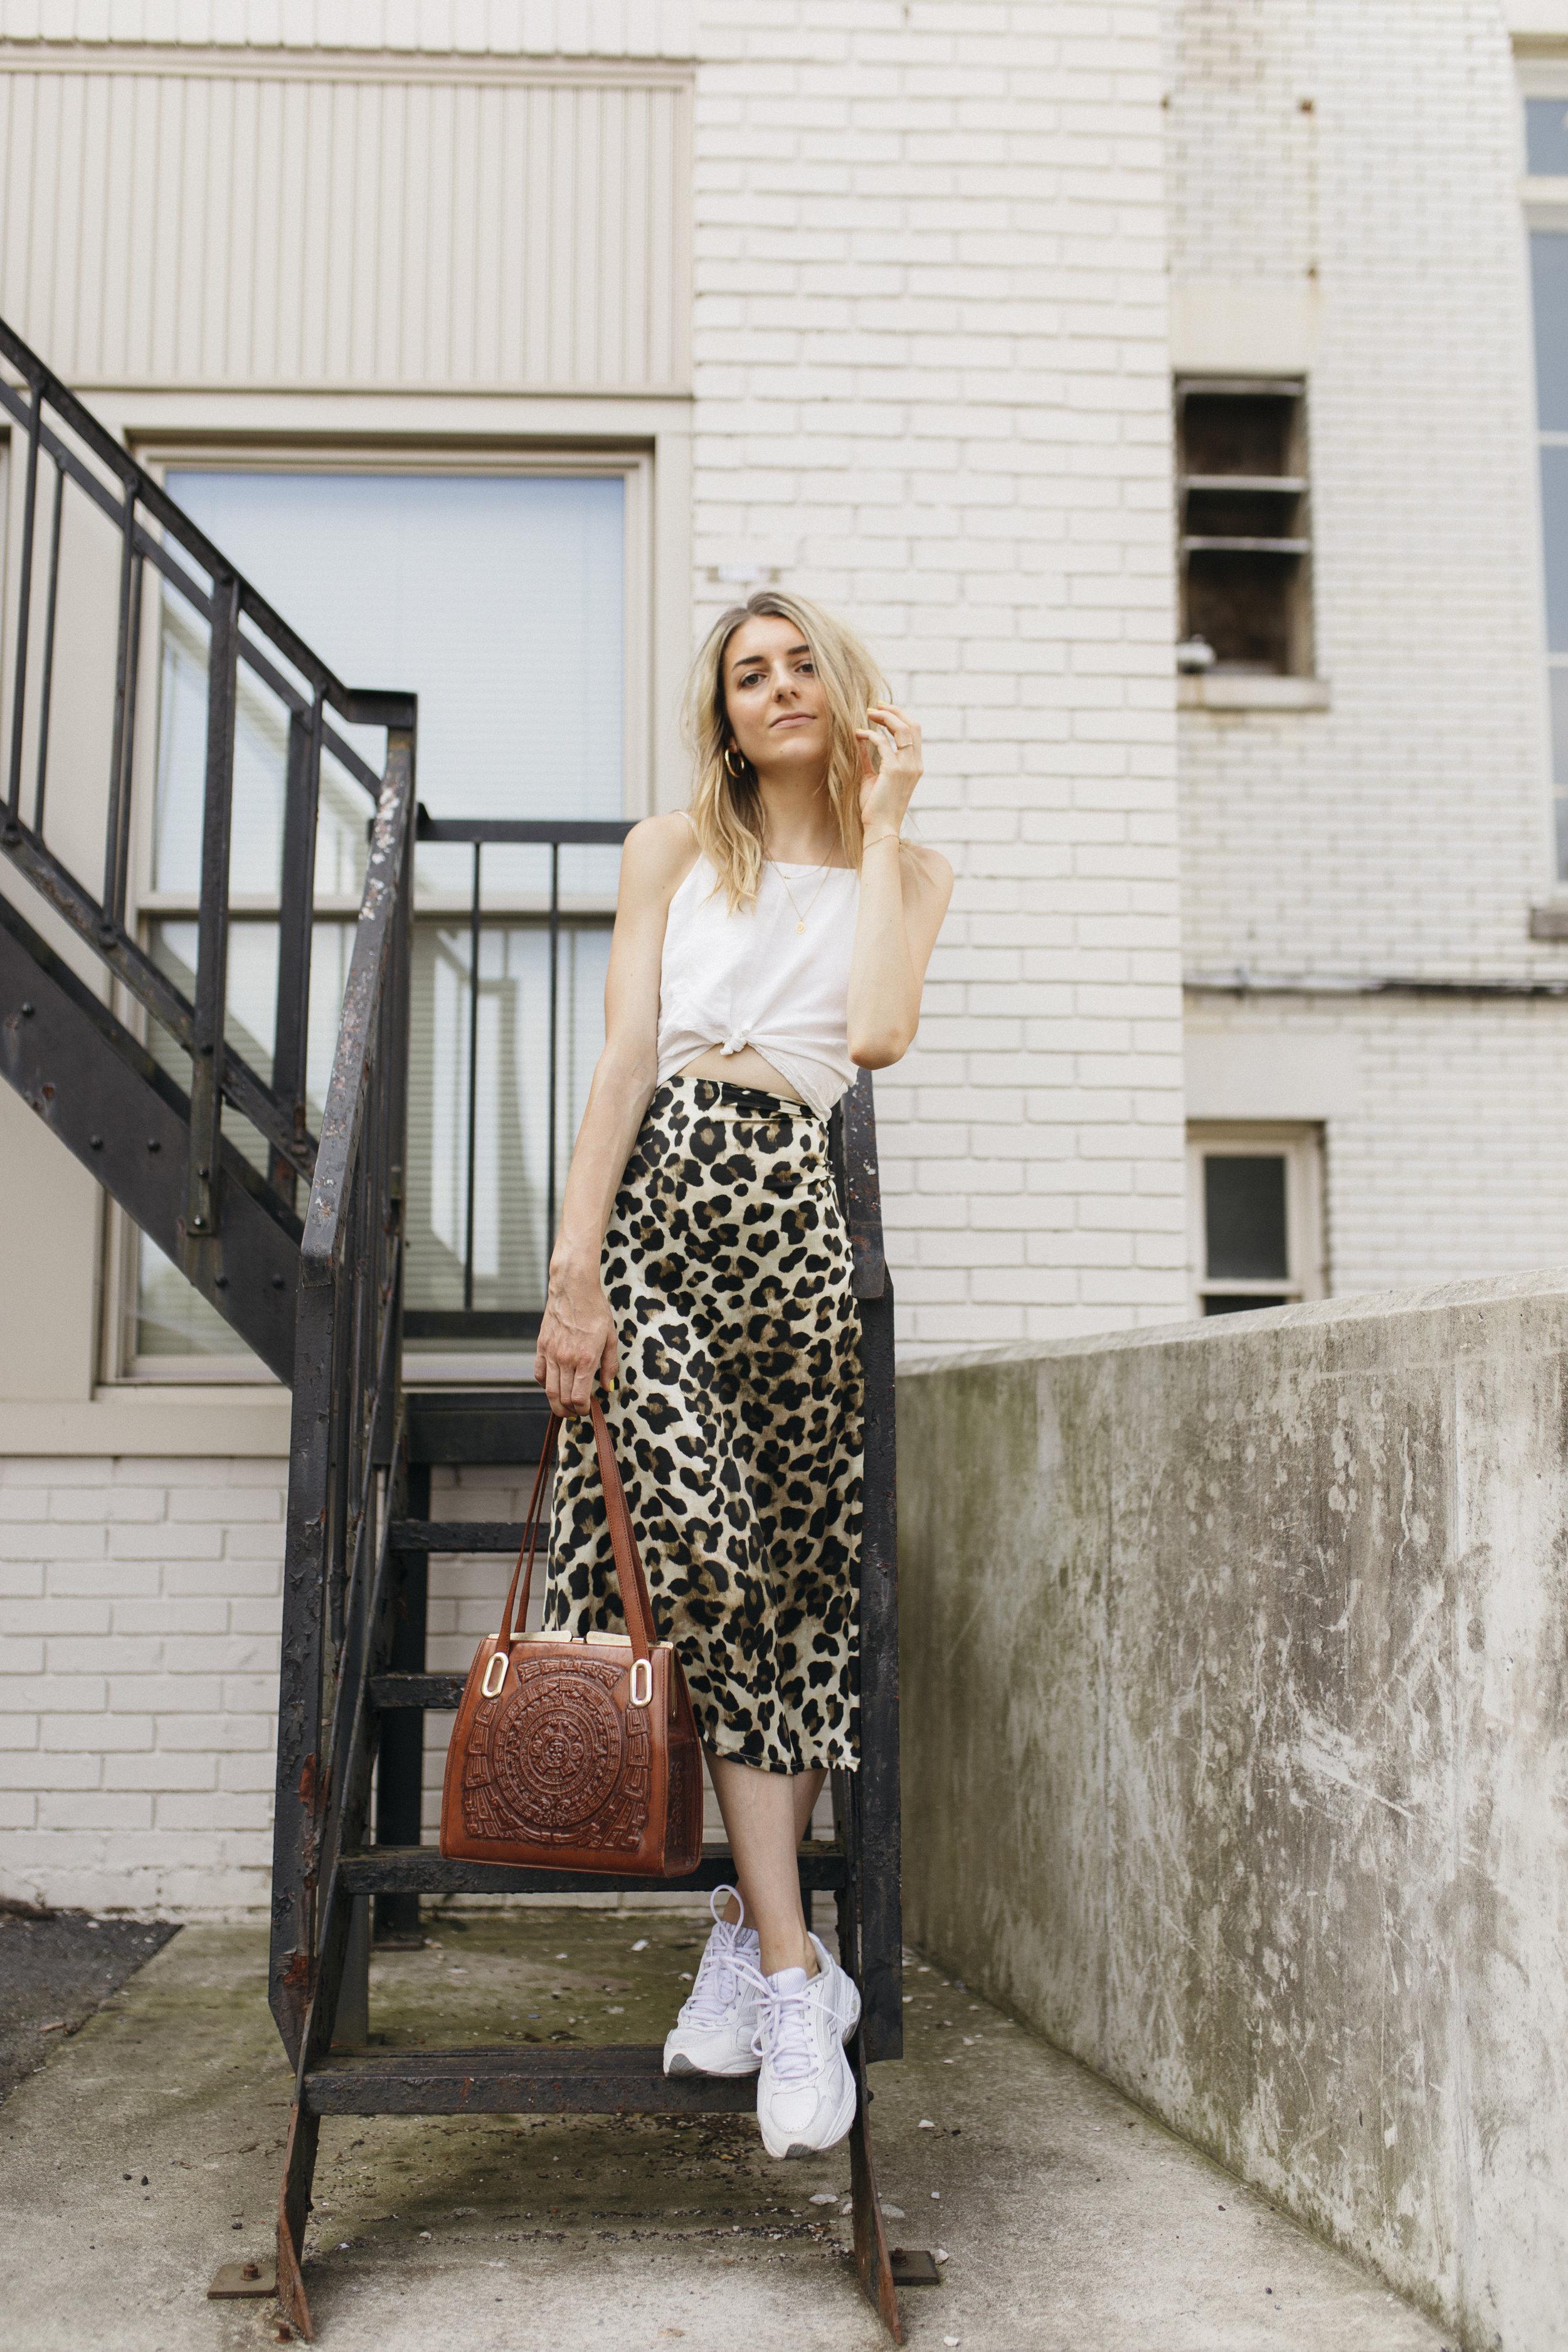 emilyrhess-blog-trends-fashion-leopard-cheetah-skirt-diy-naomi5.jpg